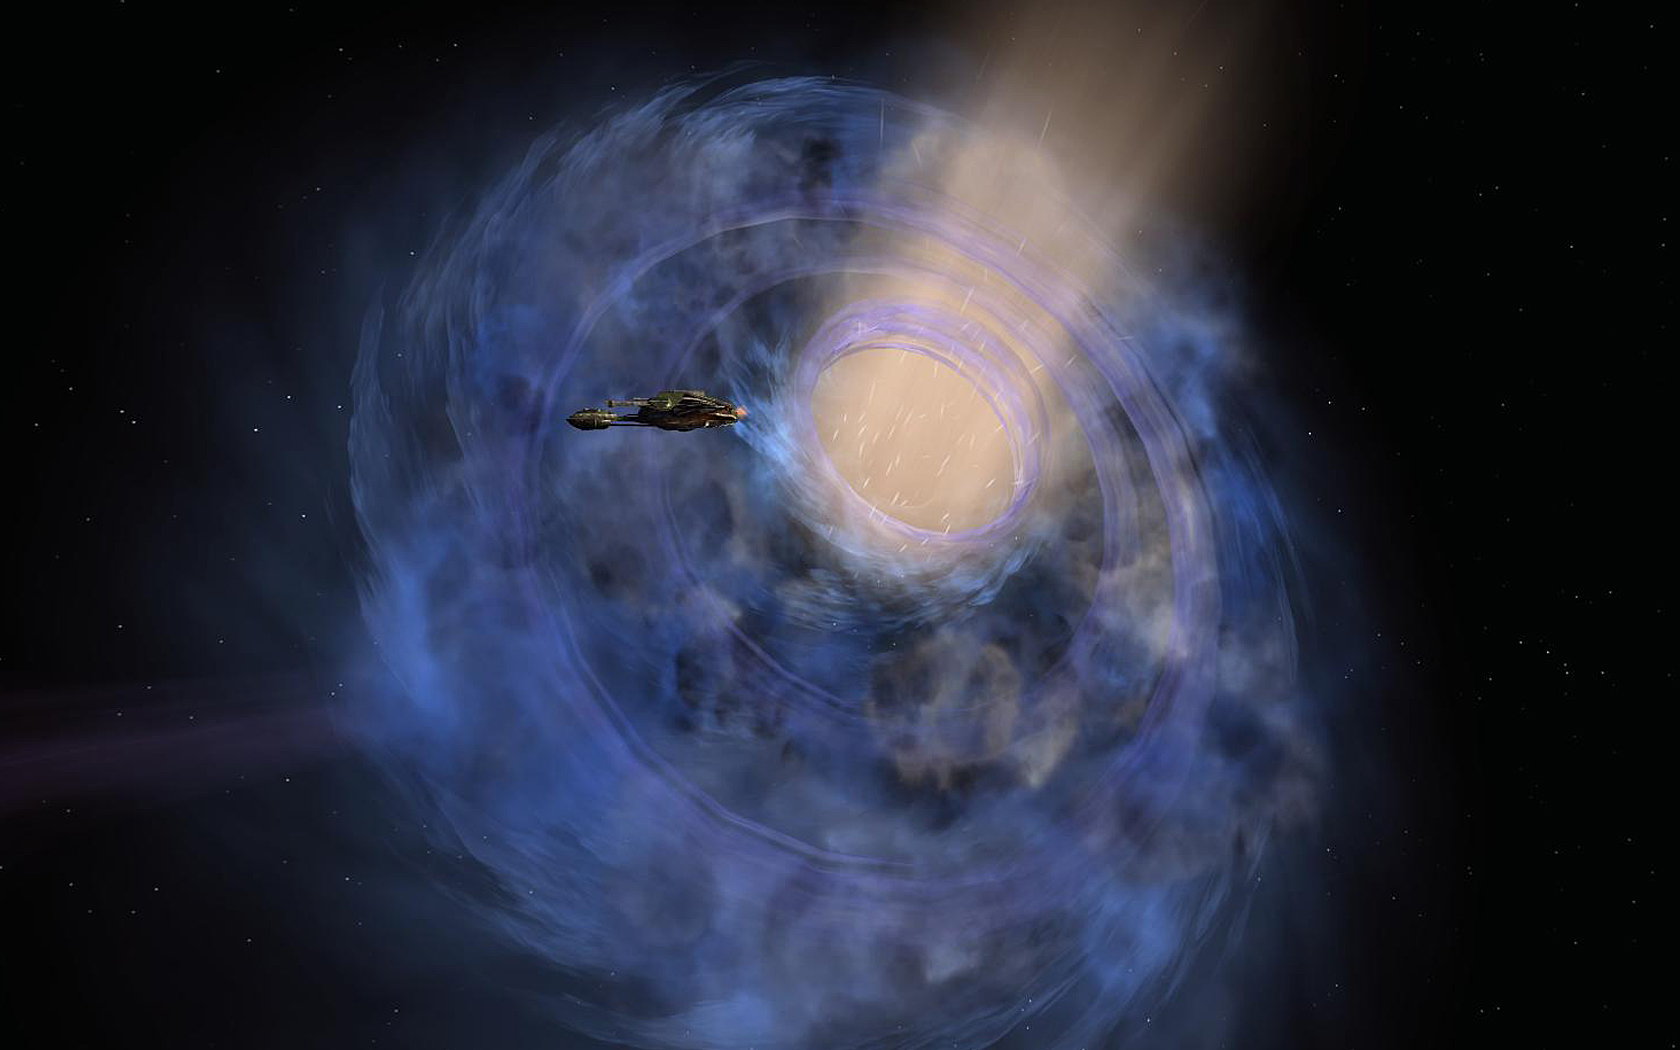 Sto Wallpaper Star Trek Online Academy